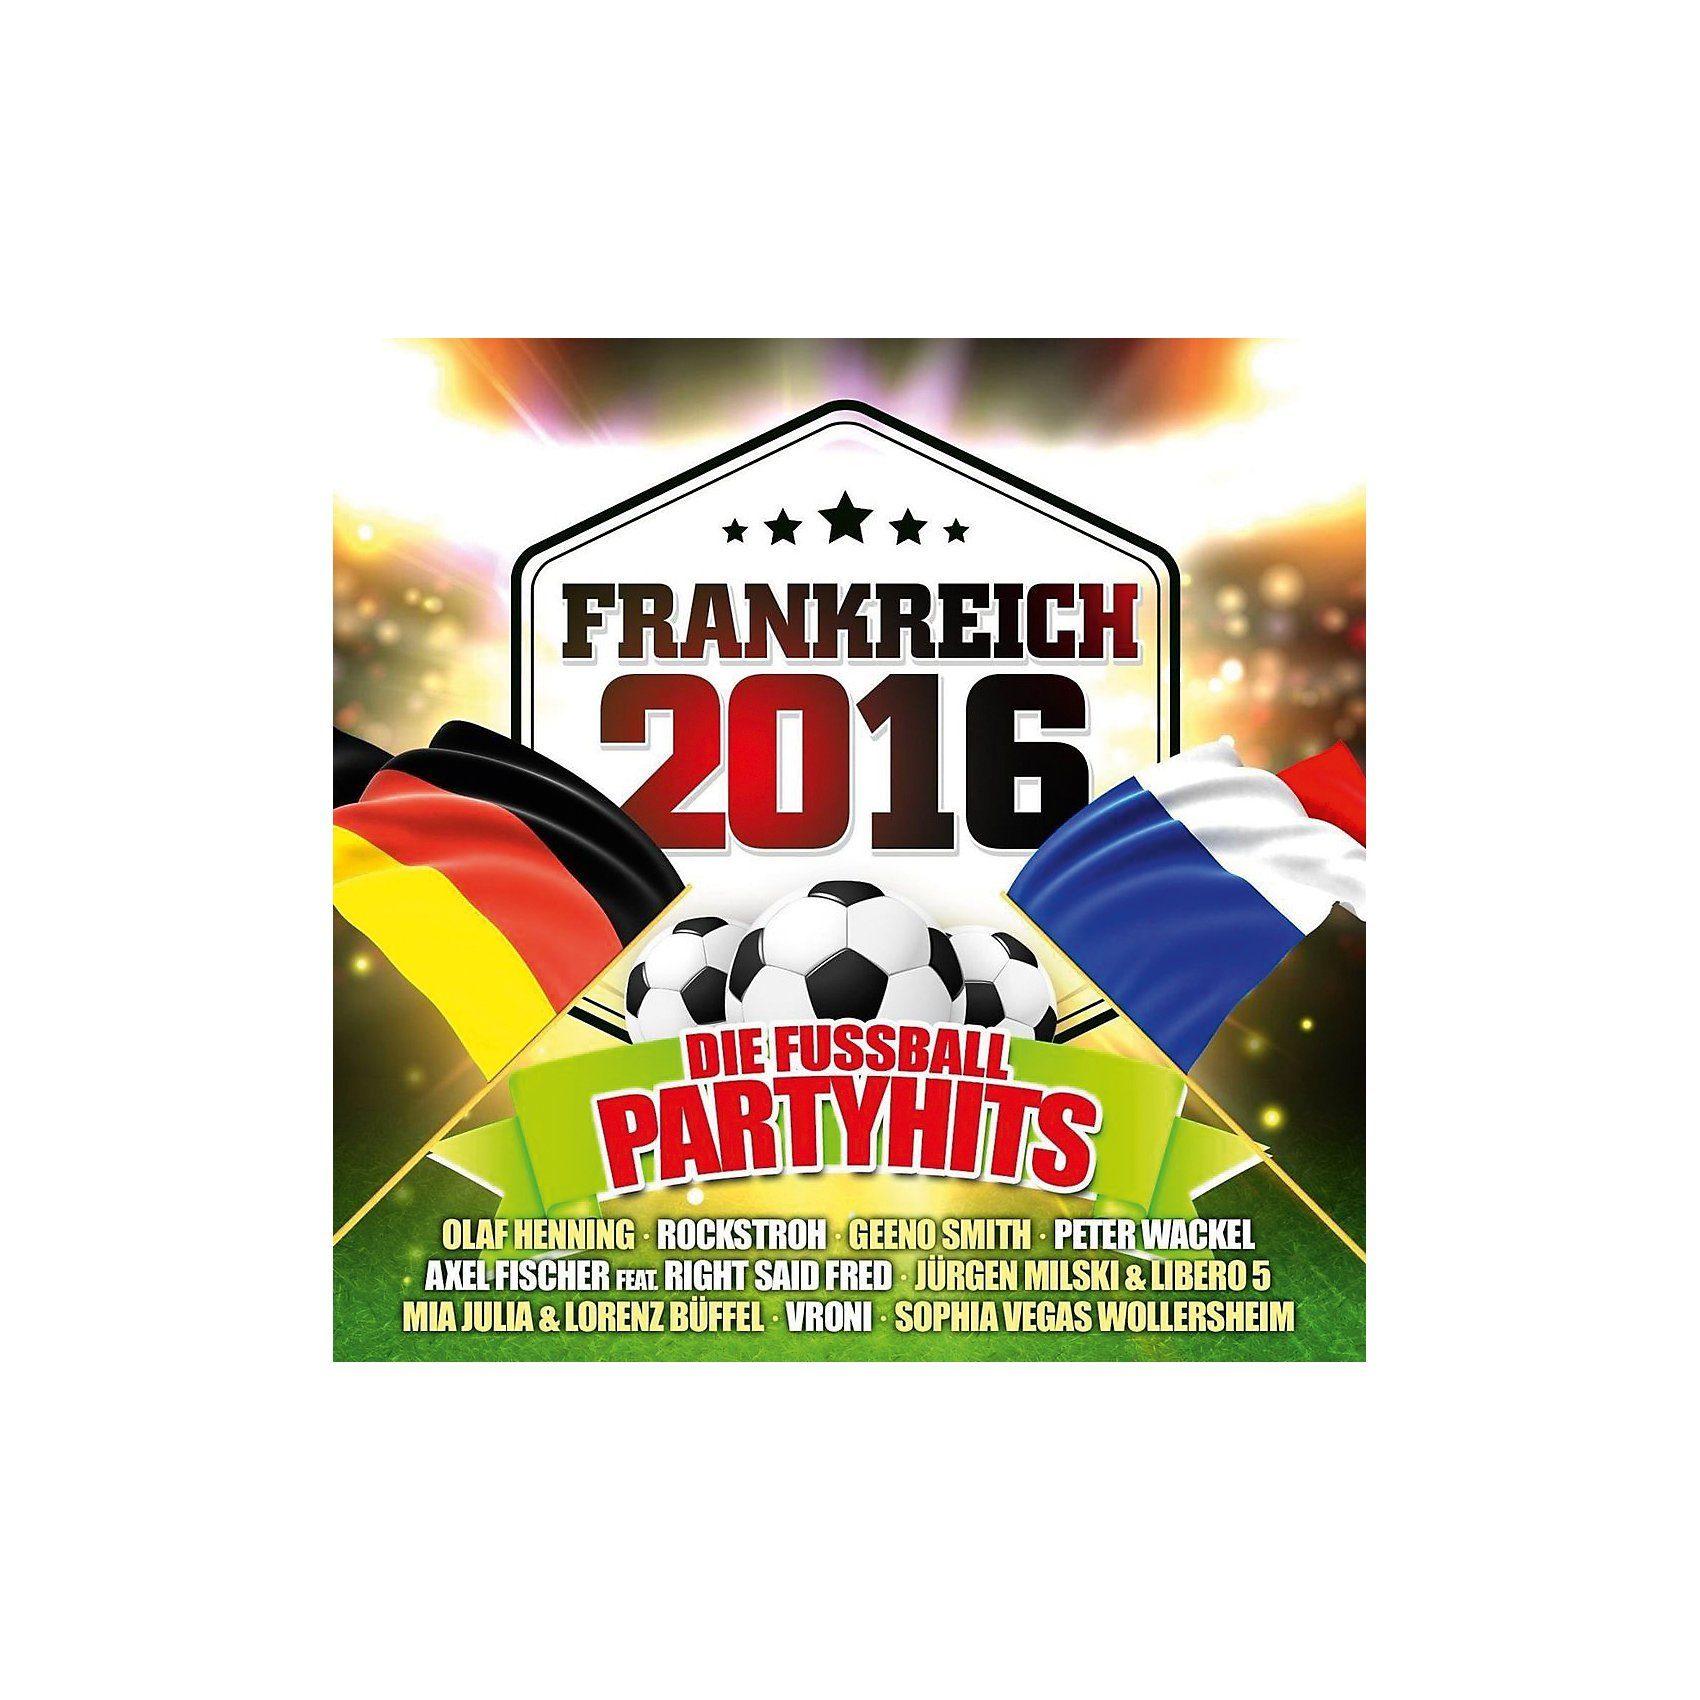 CD Frankreich 2016 - die Fußball Party Hits (2 CDs)